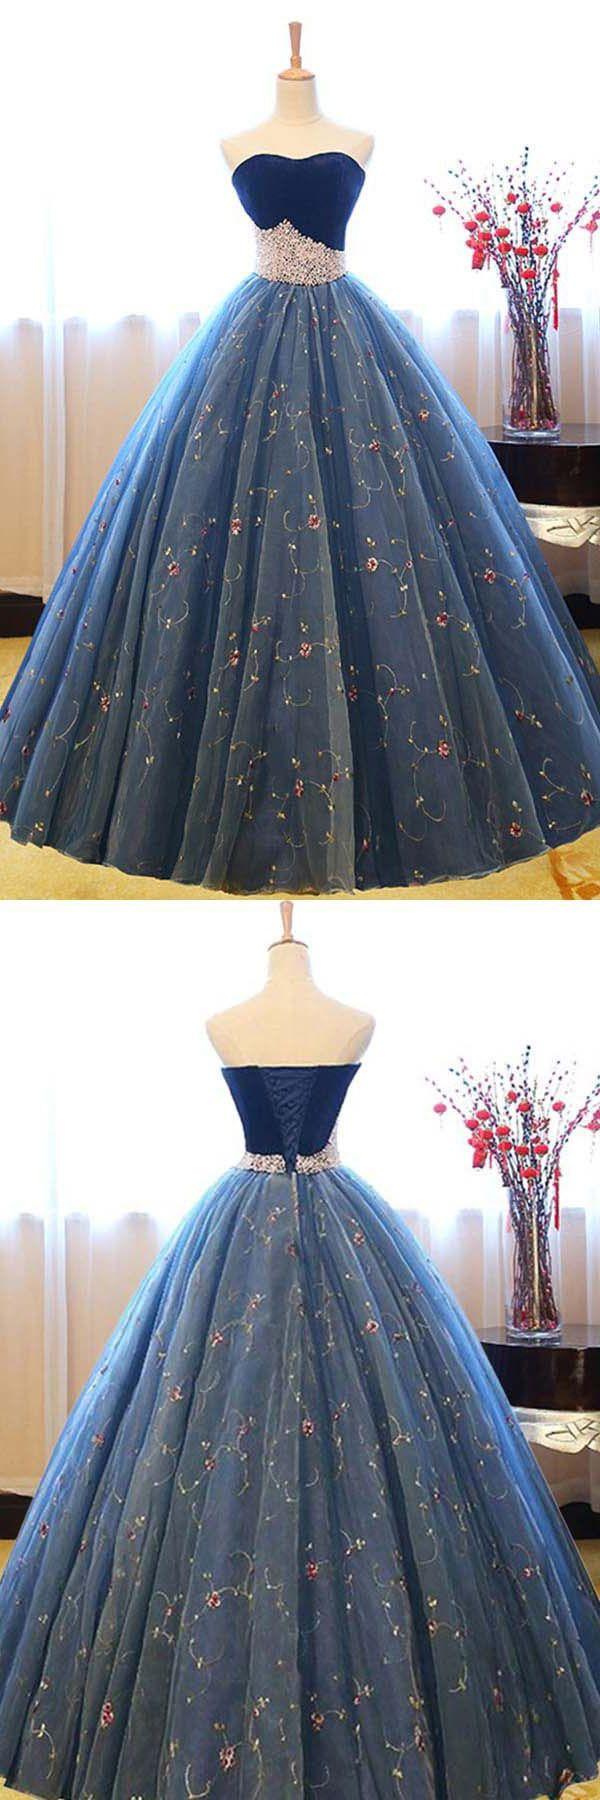 Blue prom dresses bluepromdresses navy blue prom dresses